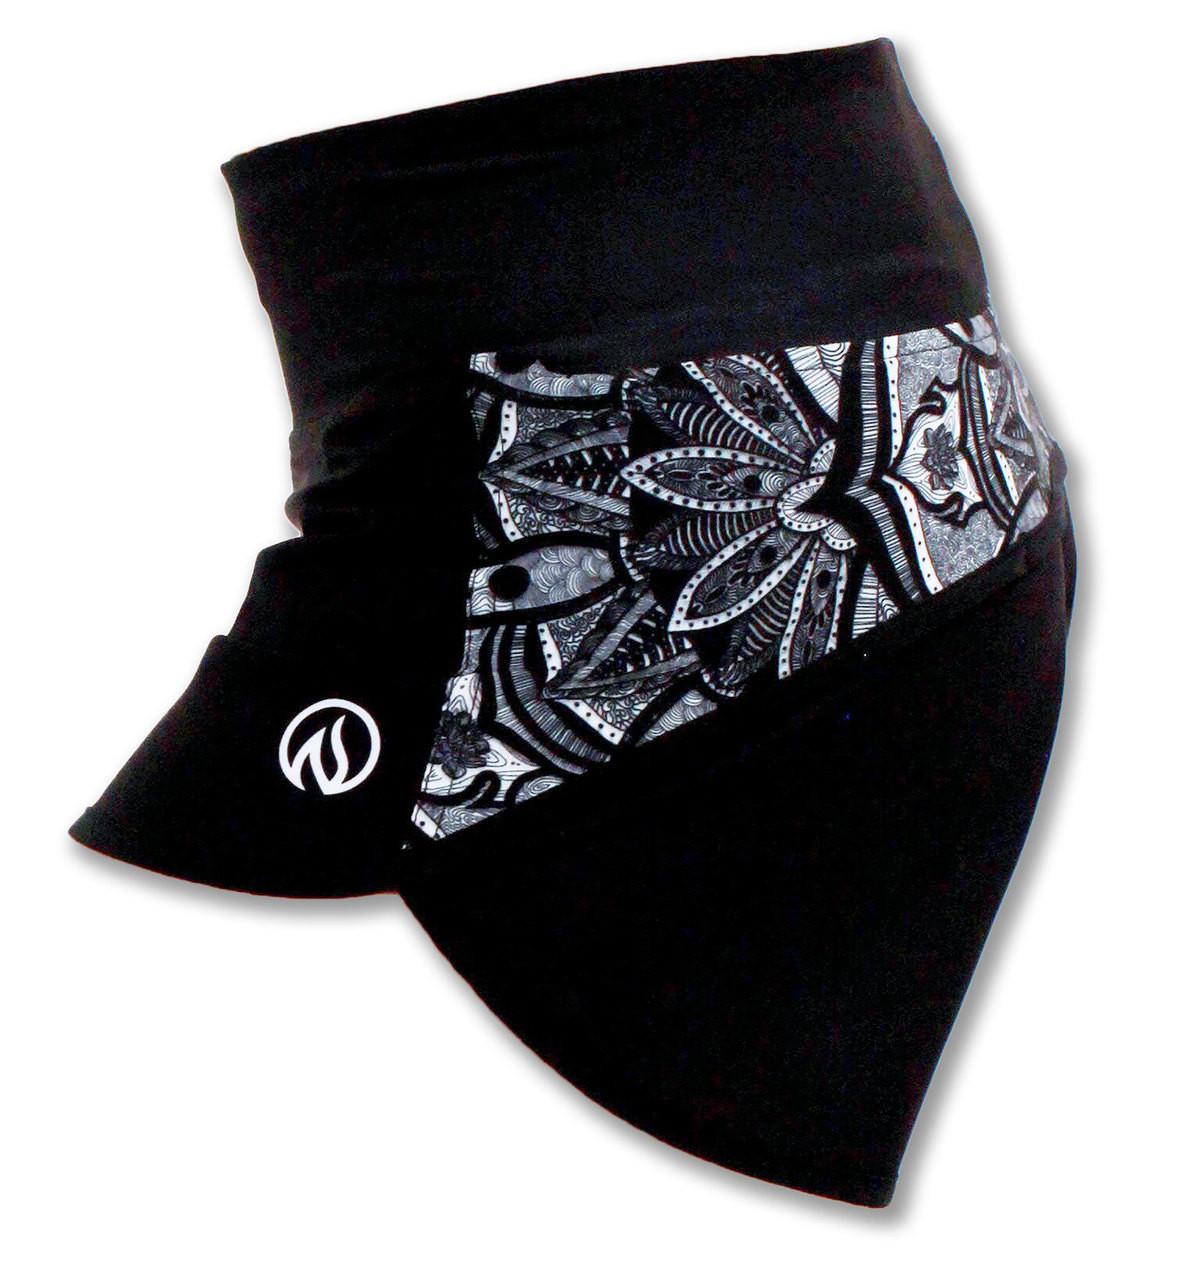 INKnBURN Healing Mandala Shorts Side Waistband Up